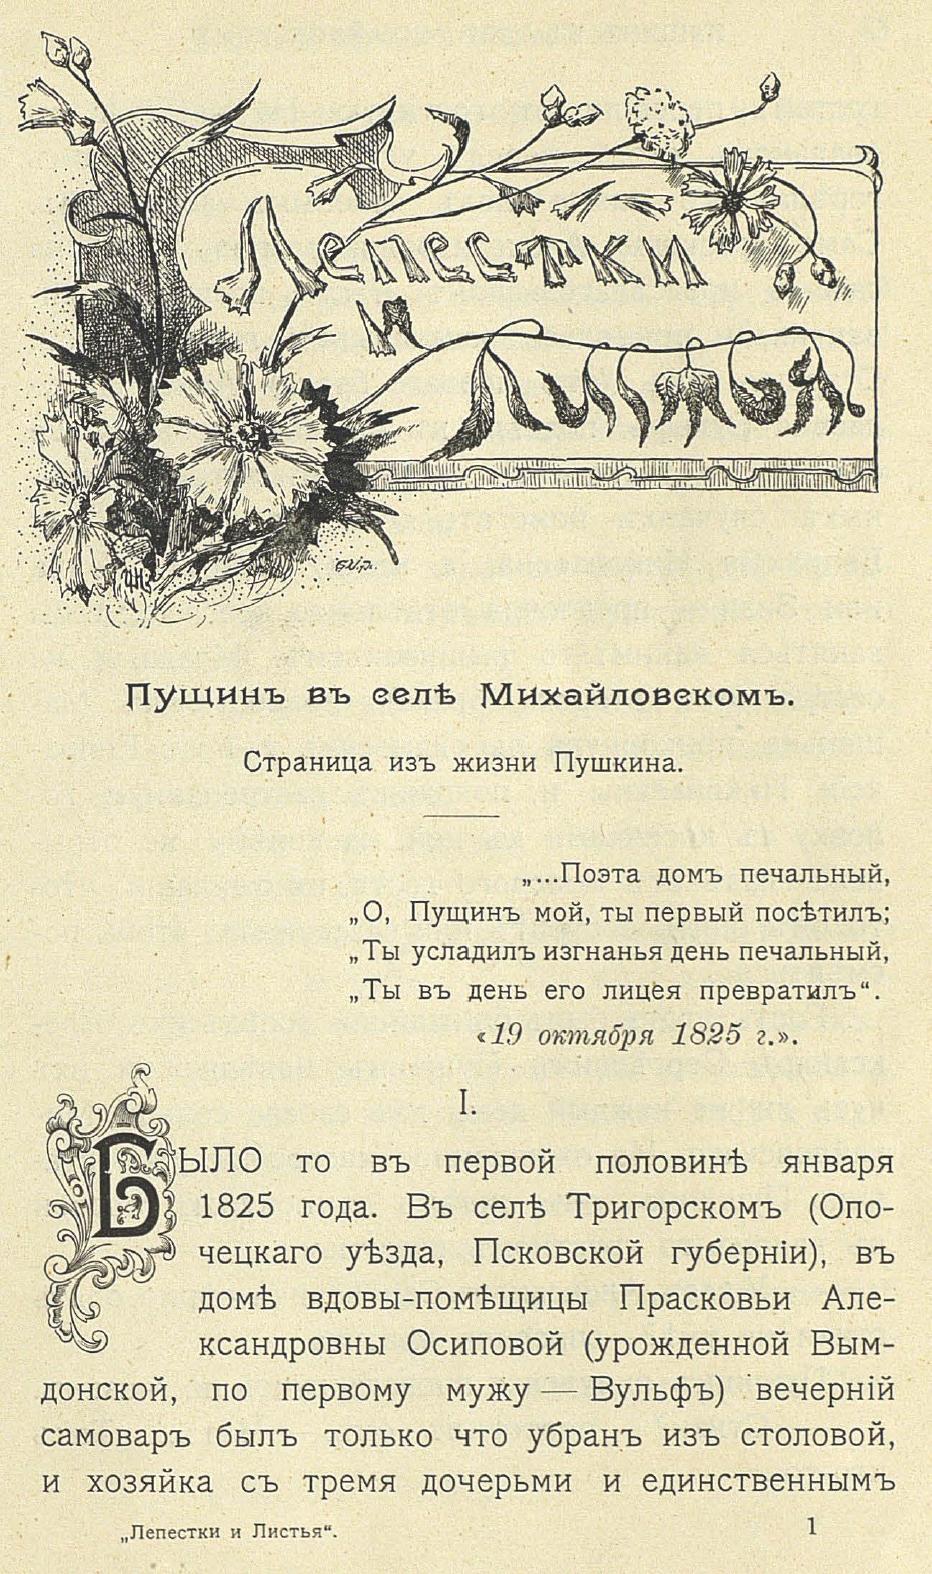 http://images.vfl.ru/ii/1407086344/8dab2ae3/5887720.jpg